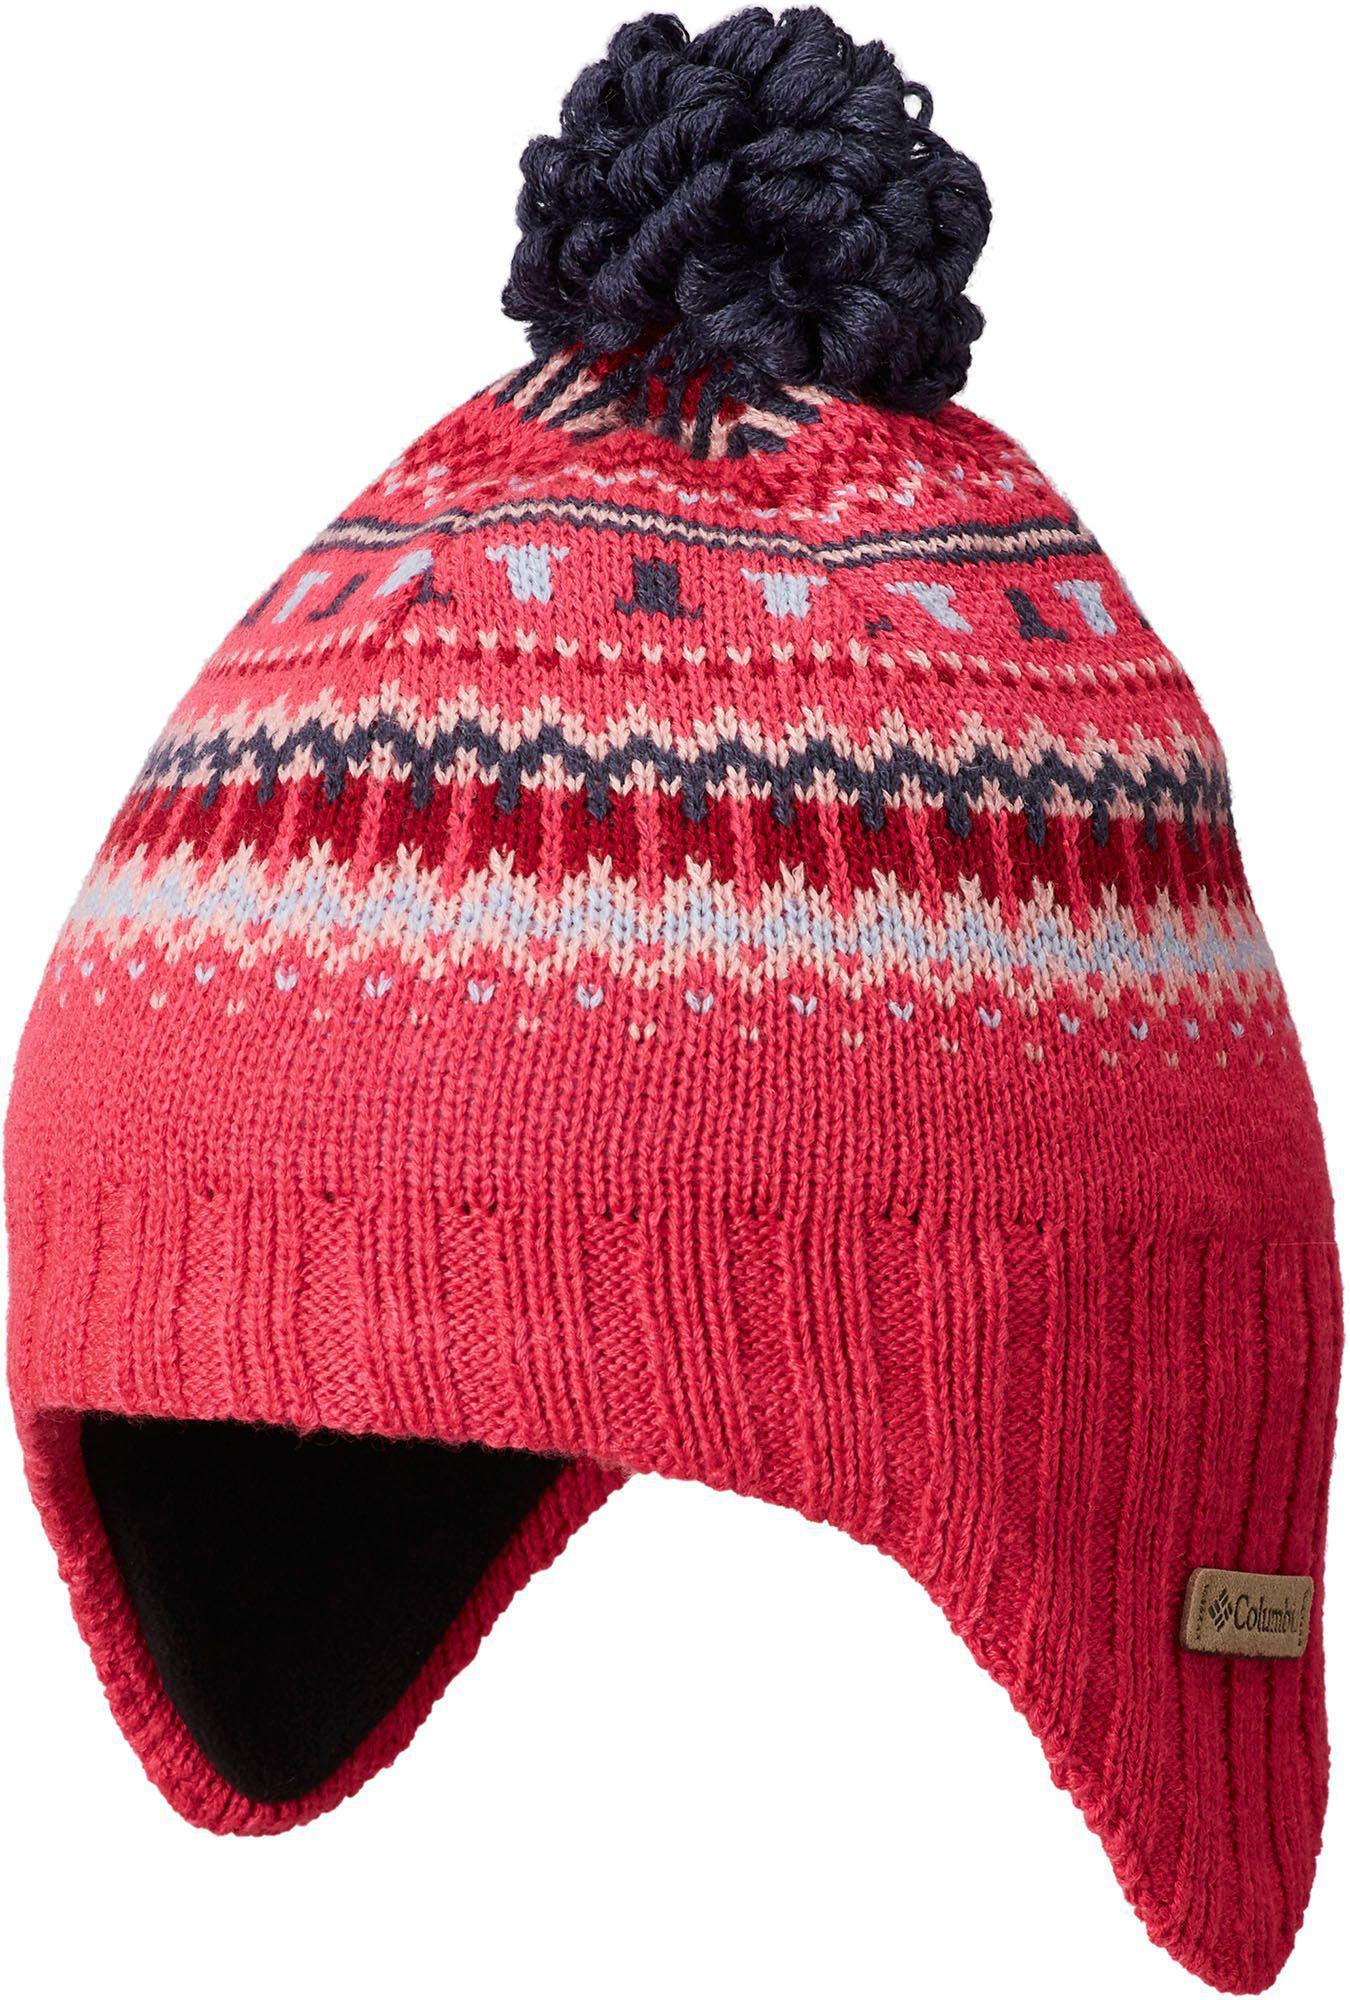 Lyst - Columbia Youth Winter Worn Ii Peruvian Hat 884dcb805b80